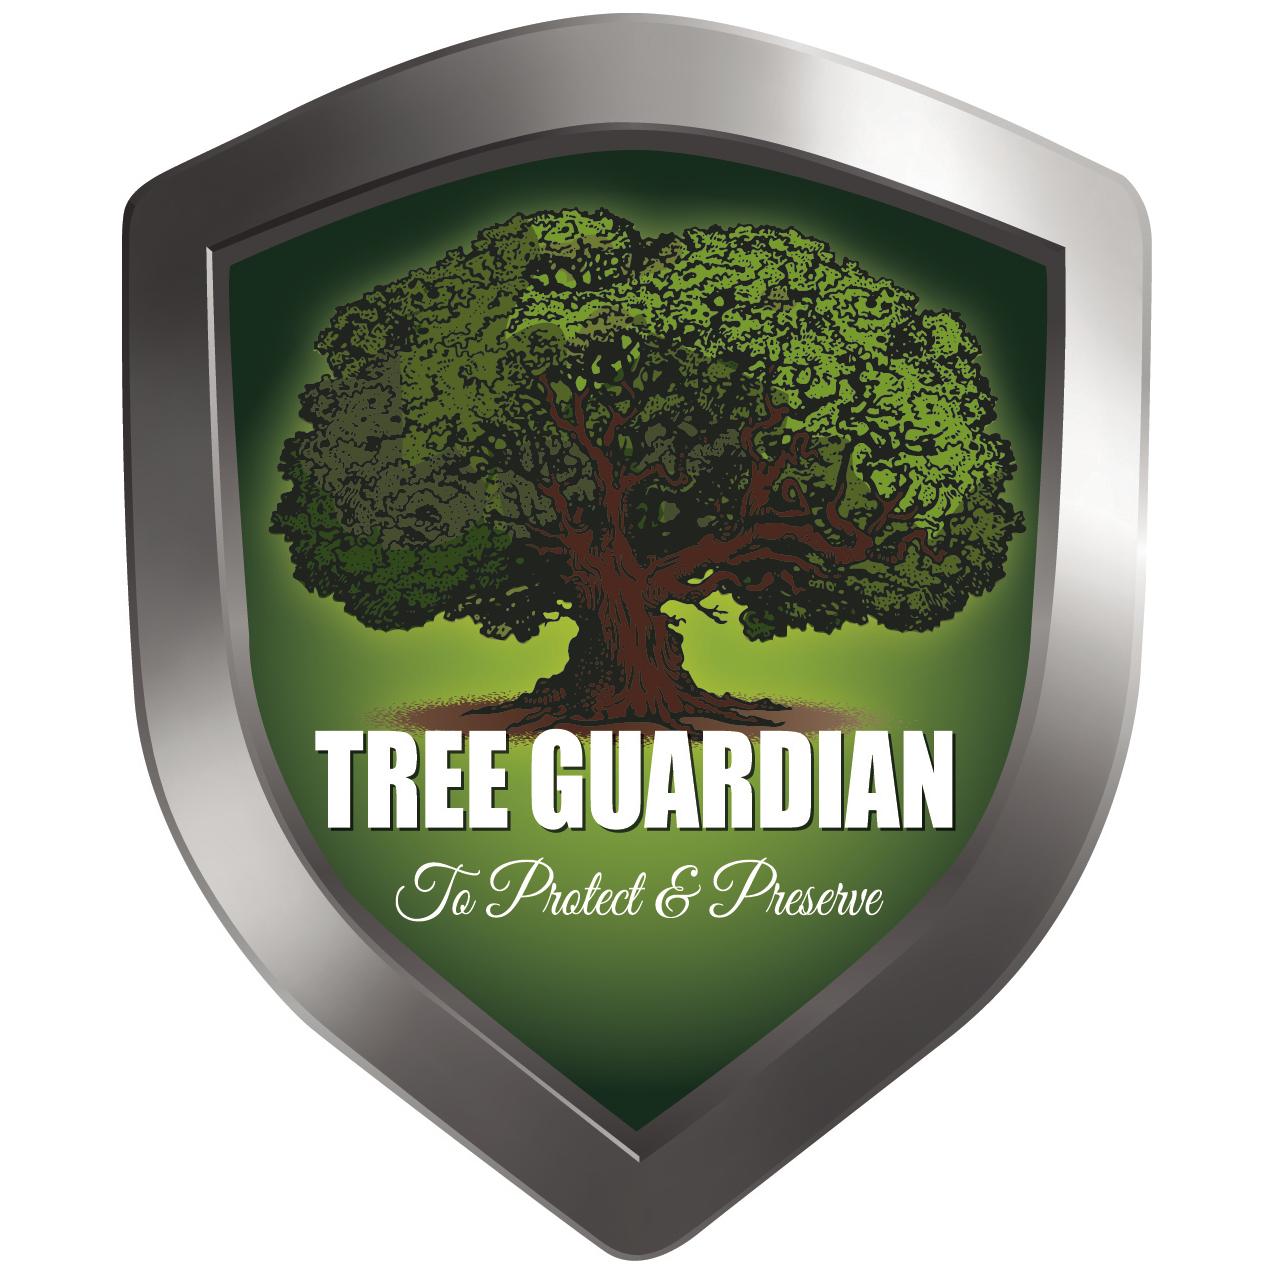 Tree Guardian